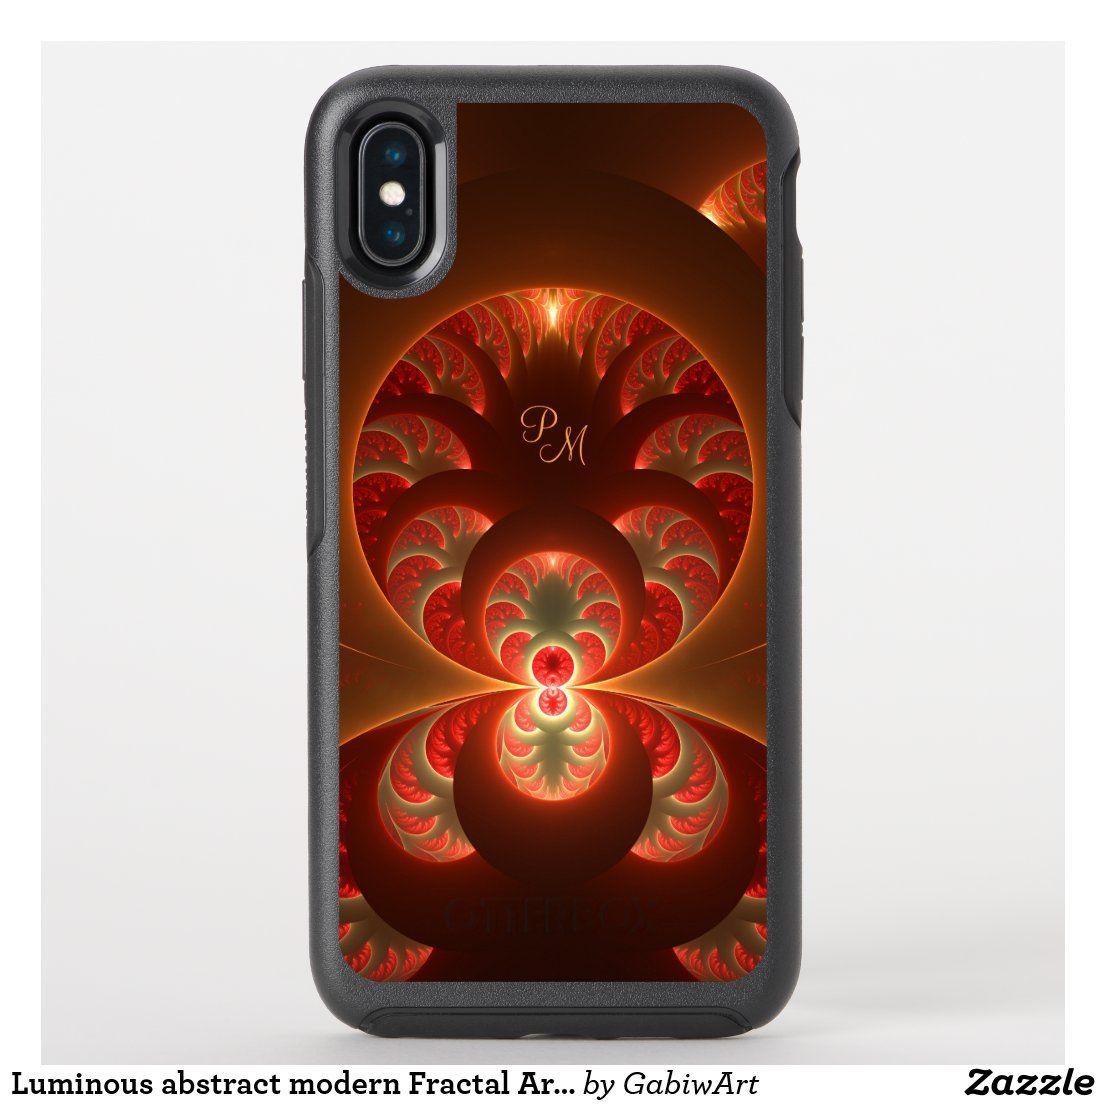 Luminous Abstract Modern Fractal Art Monogram Otterbox Iphone Case Zazzle Com Speck Iphone Cases Iphone Cases Otterbox Fractals